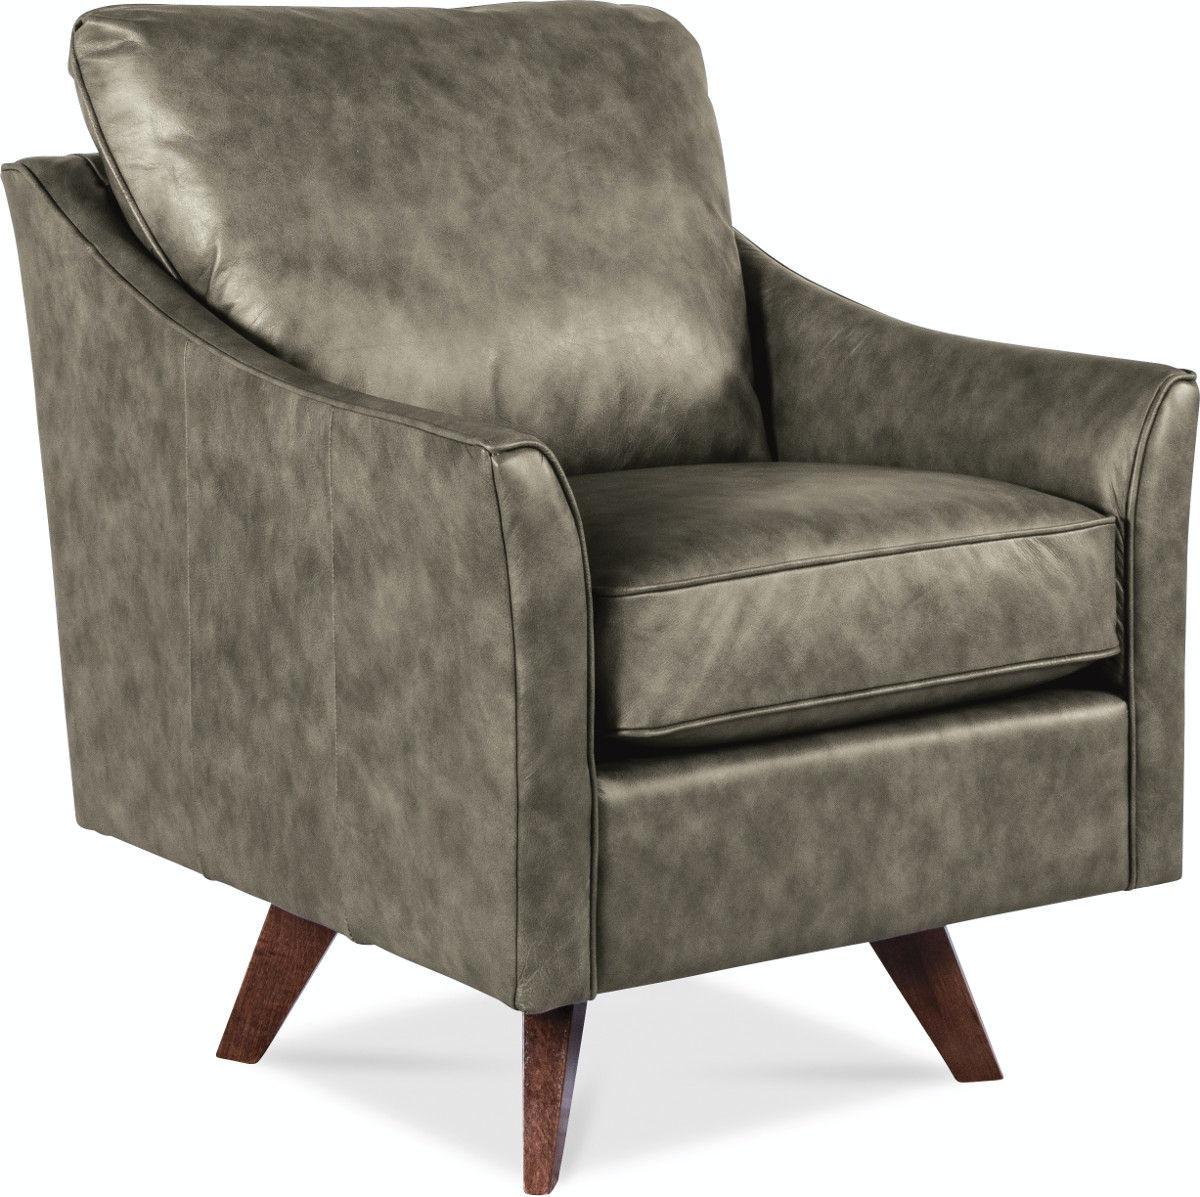 Attrayant Frazier And Son Furniture